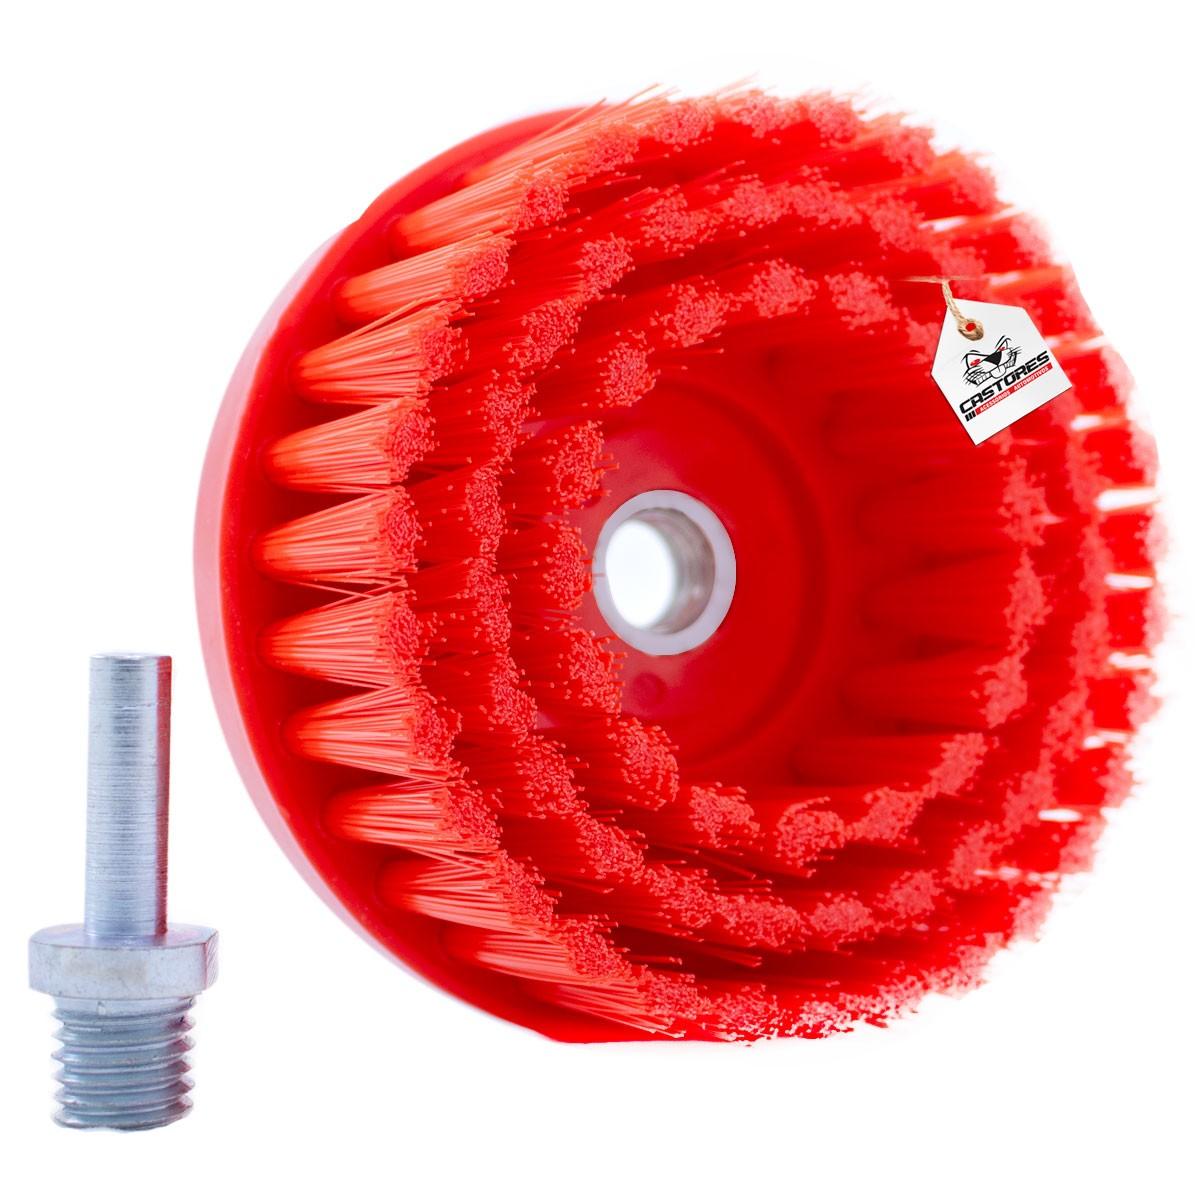 Escova Drill Detailer Cerdas Agressiva Vermelha